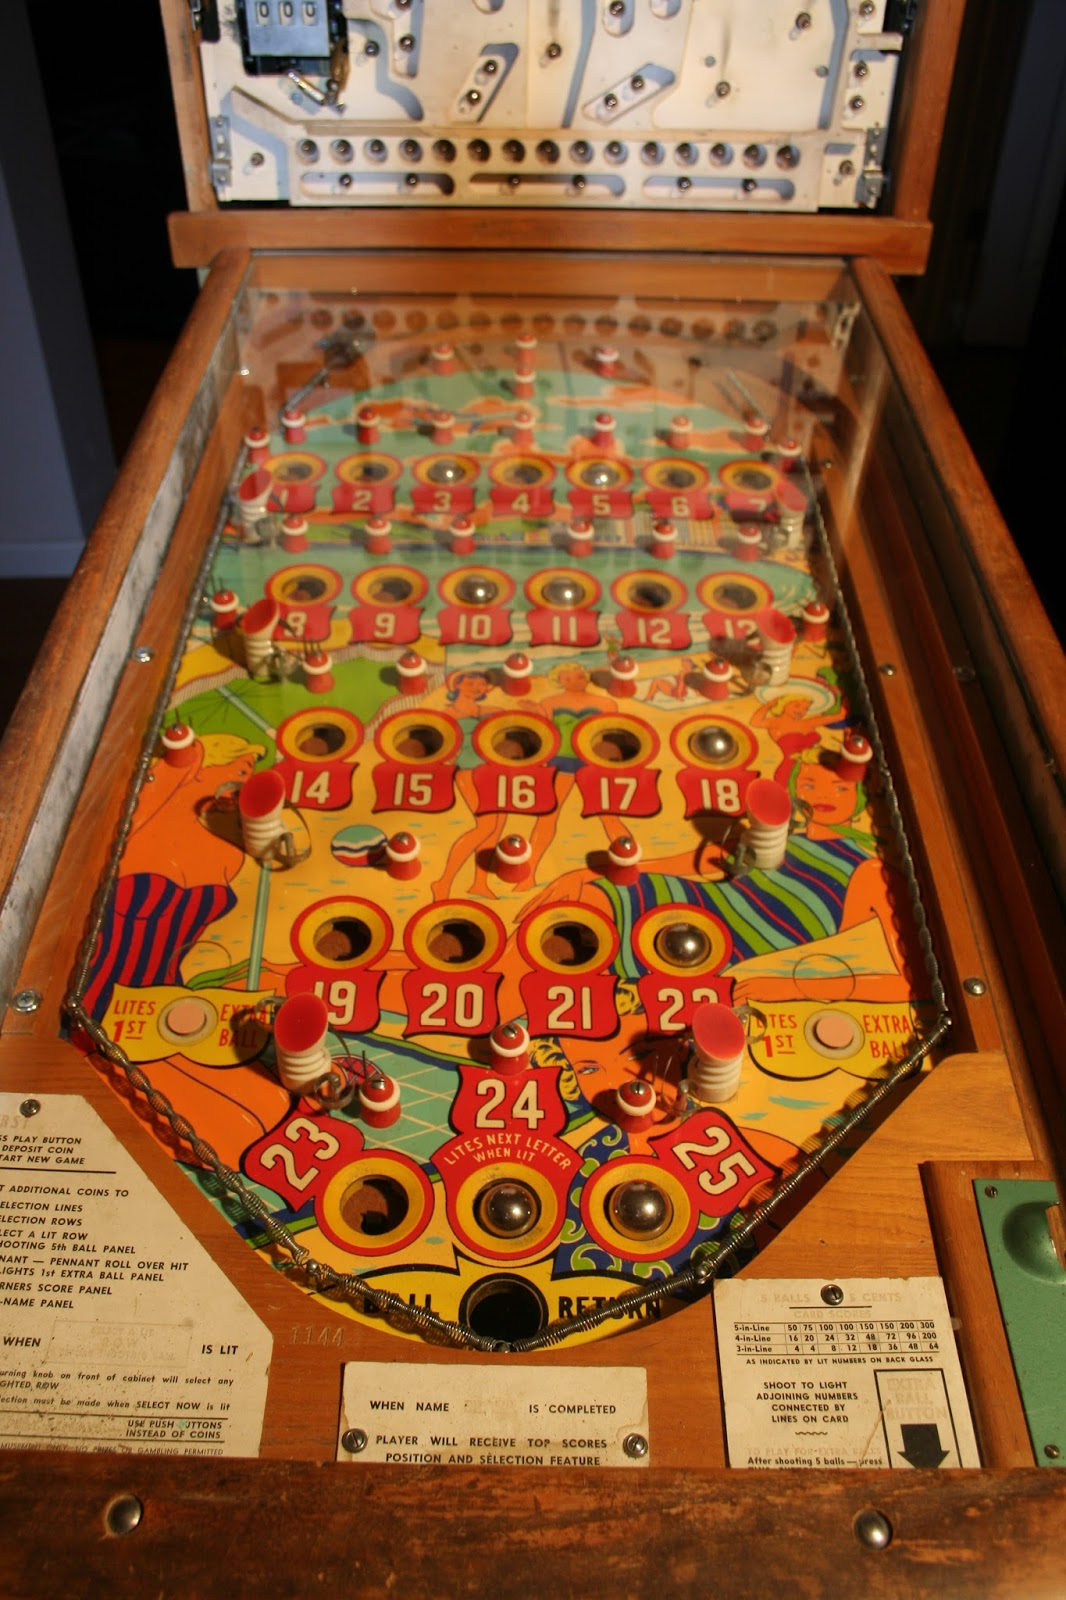 Pinball Repair And Fun: United Brazil Bingo Pinball Regarding Bingo At Turning Stone March 13